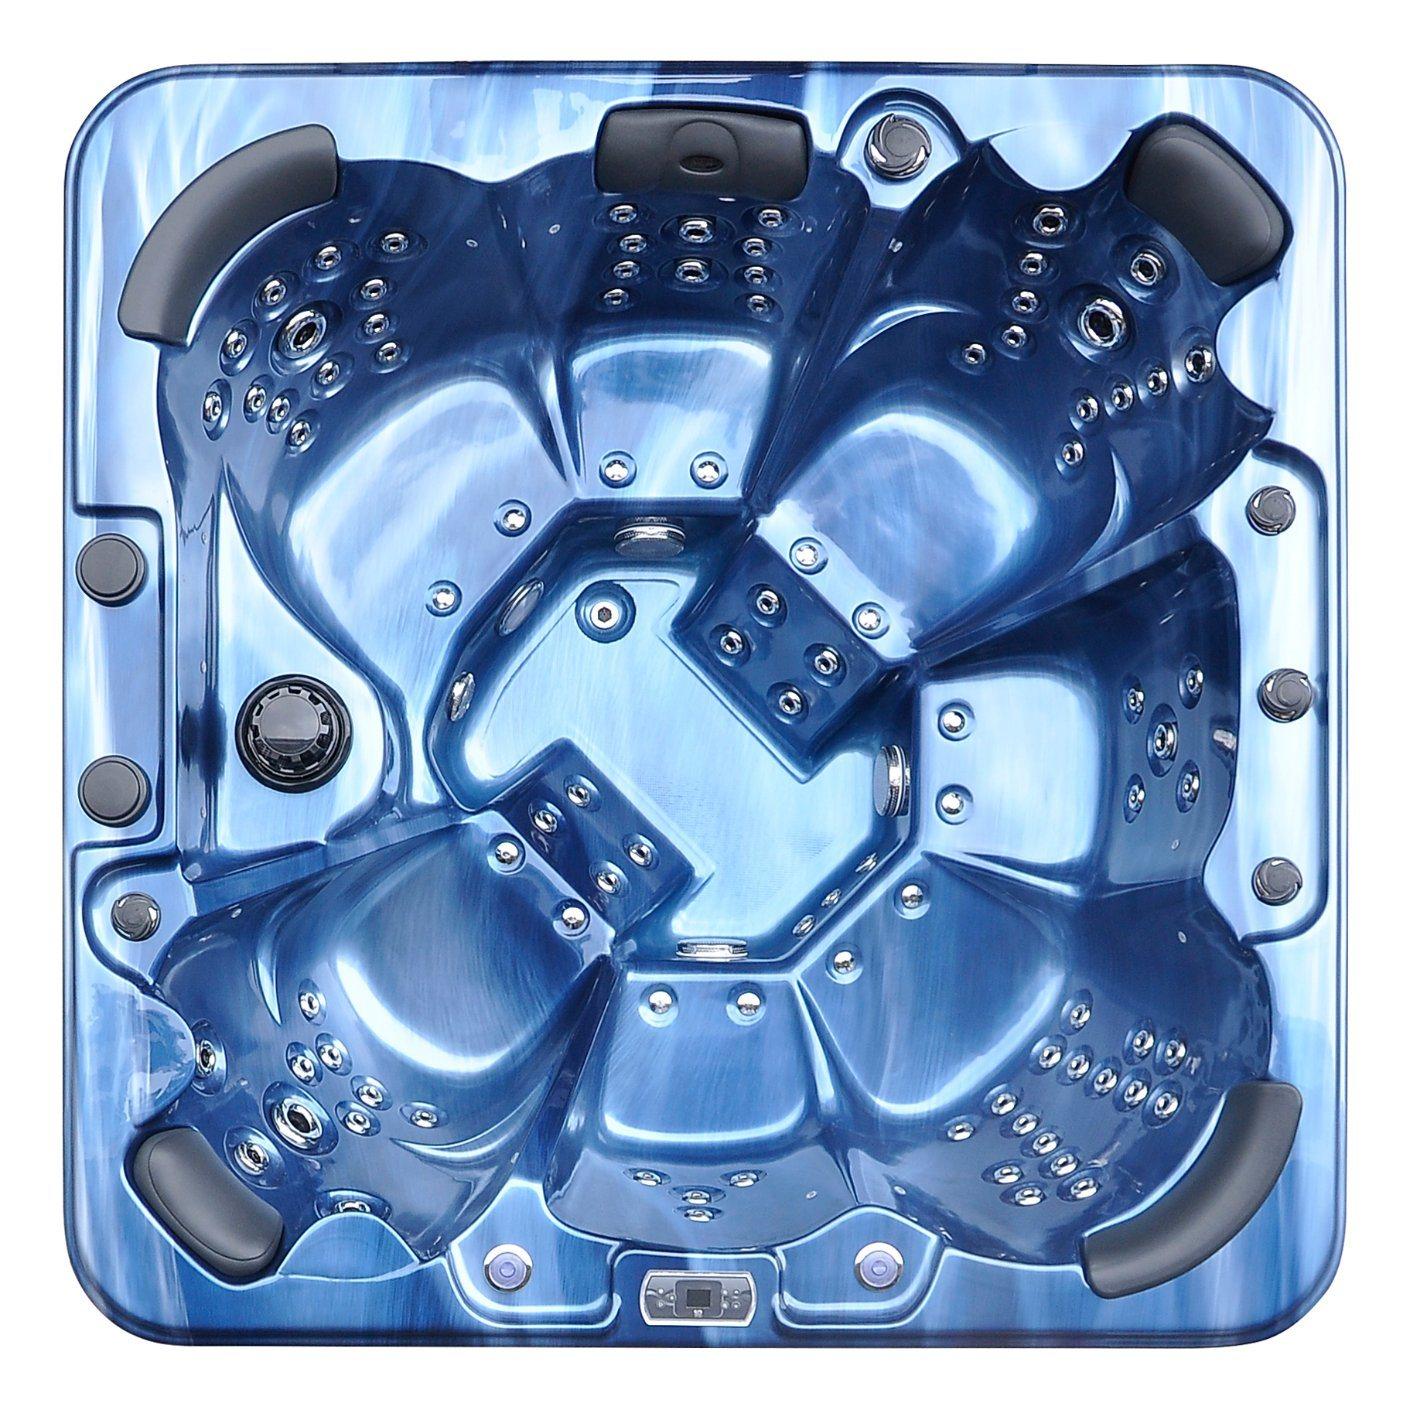 China Kingston Blue Acrylic 96 Jets Bathtub Whirlpool SPA Swimming ...